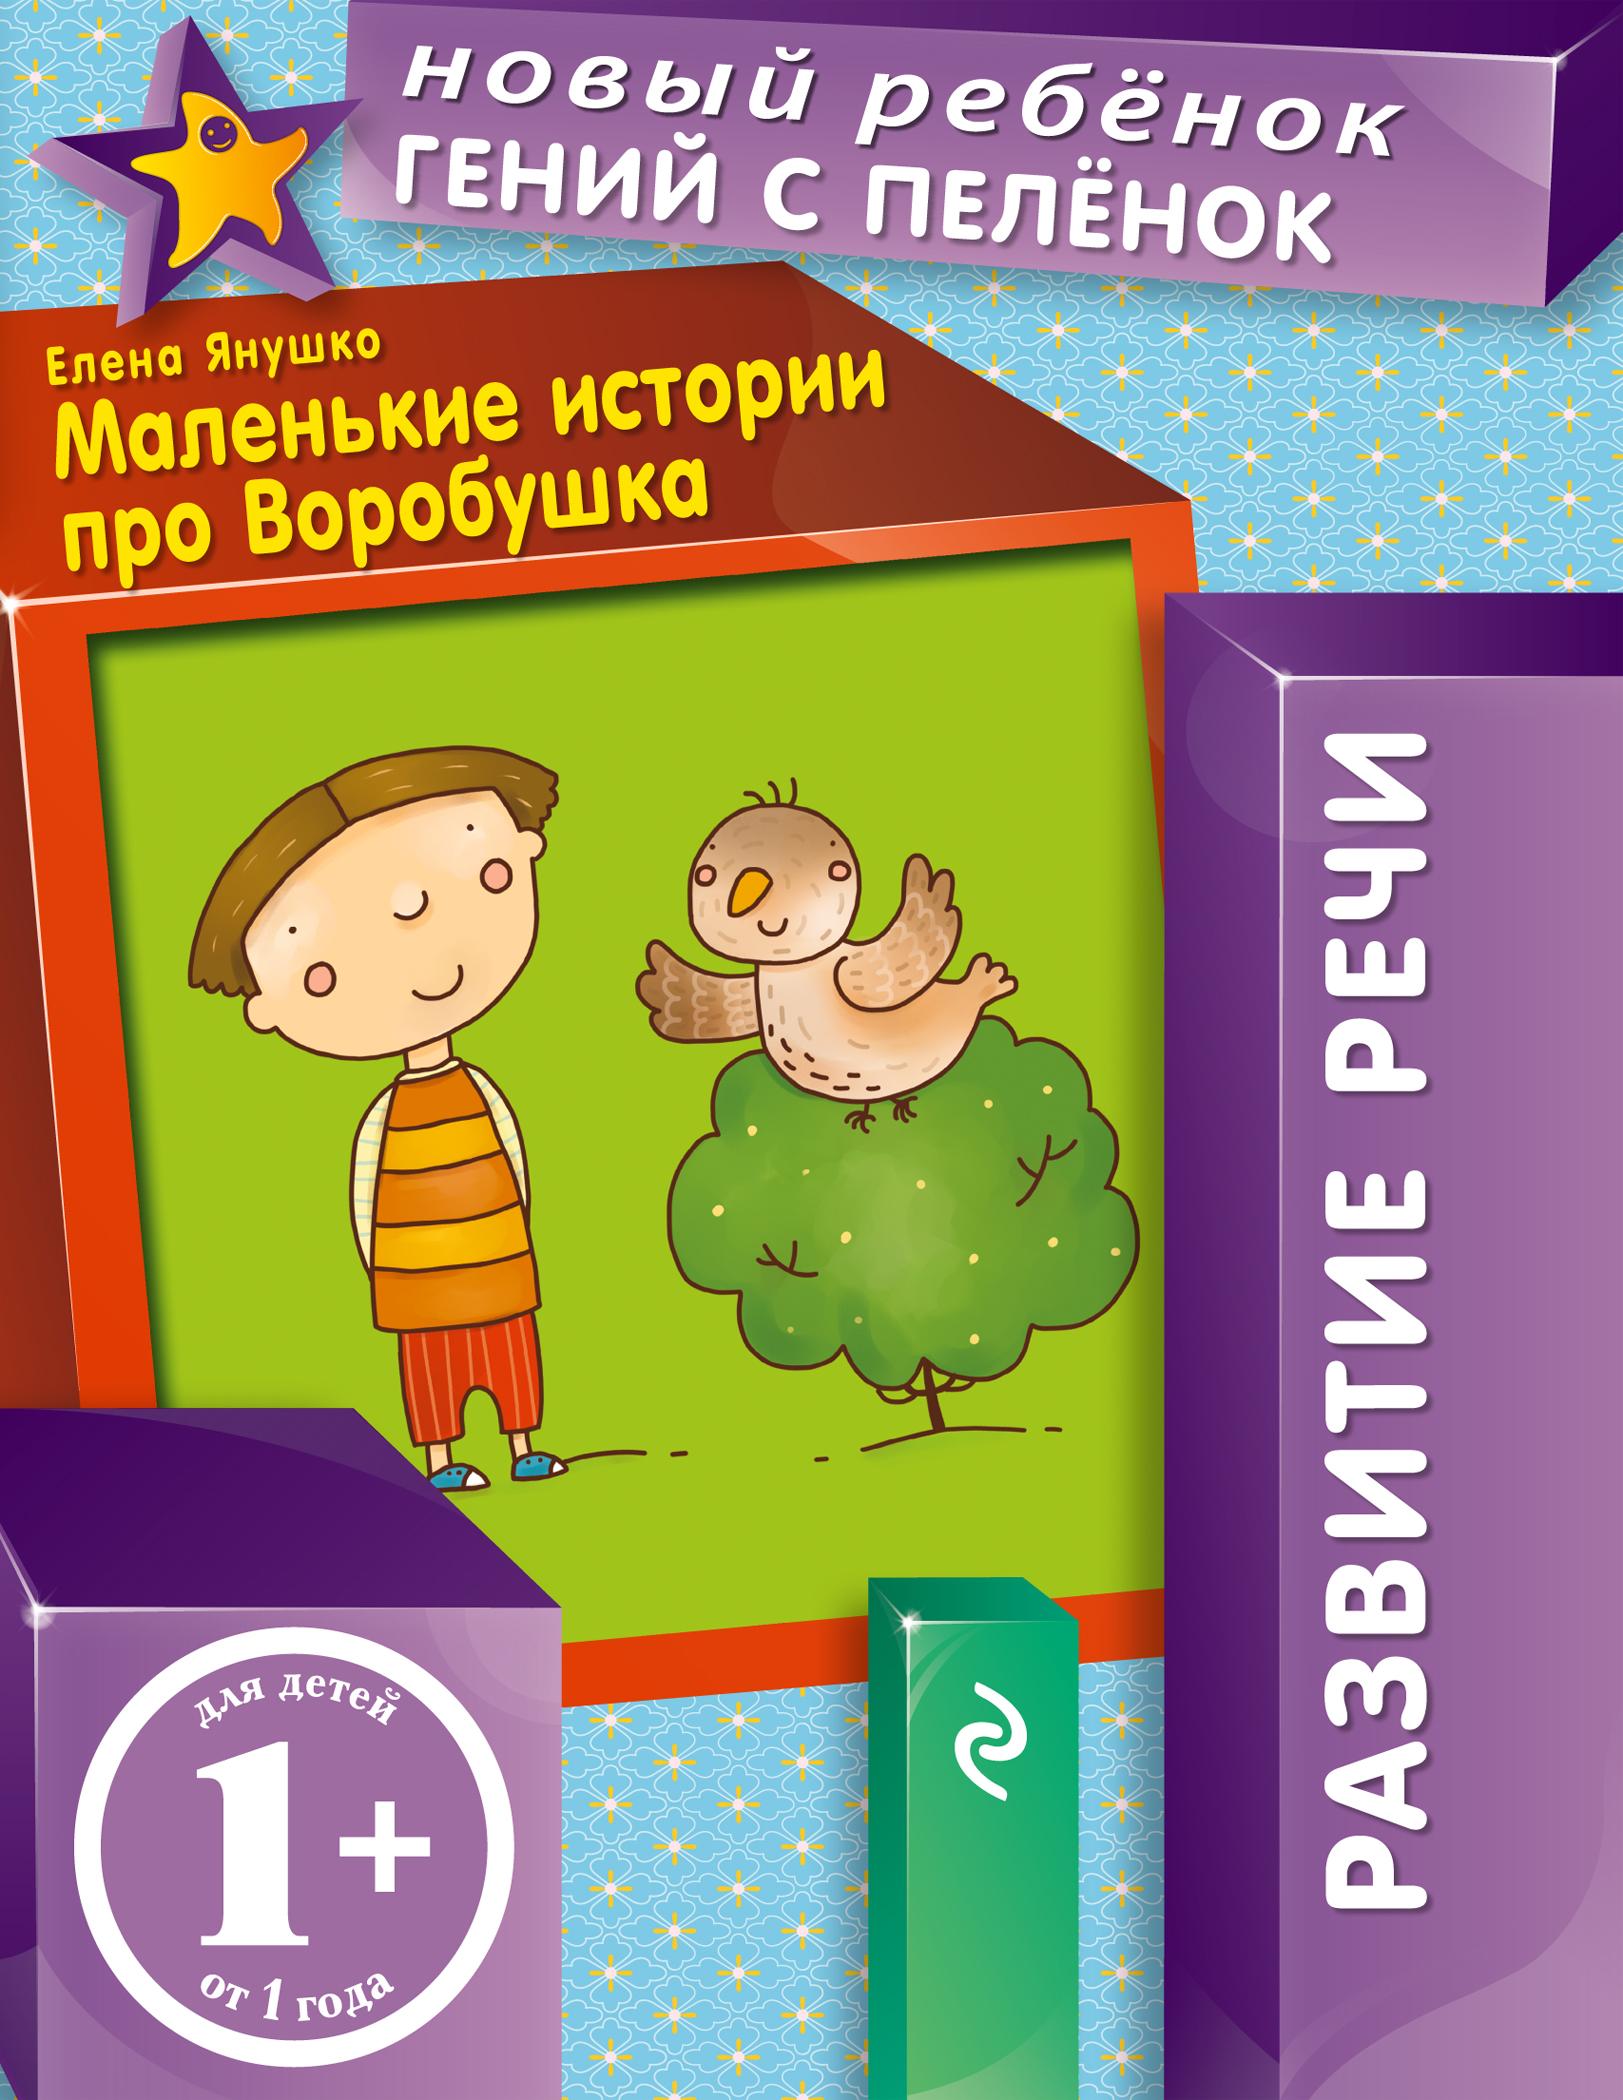 1+ Маленькие истории про Воробушка ( Янушко Е.А.  )